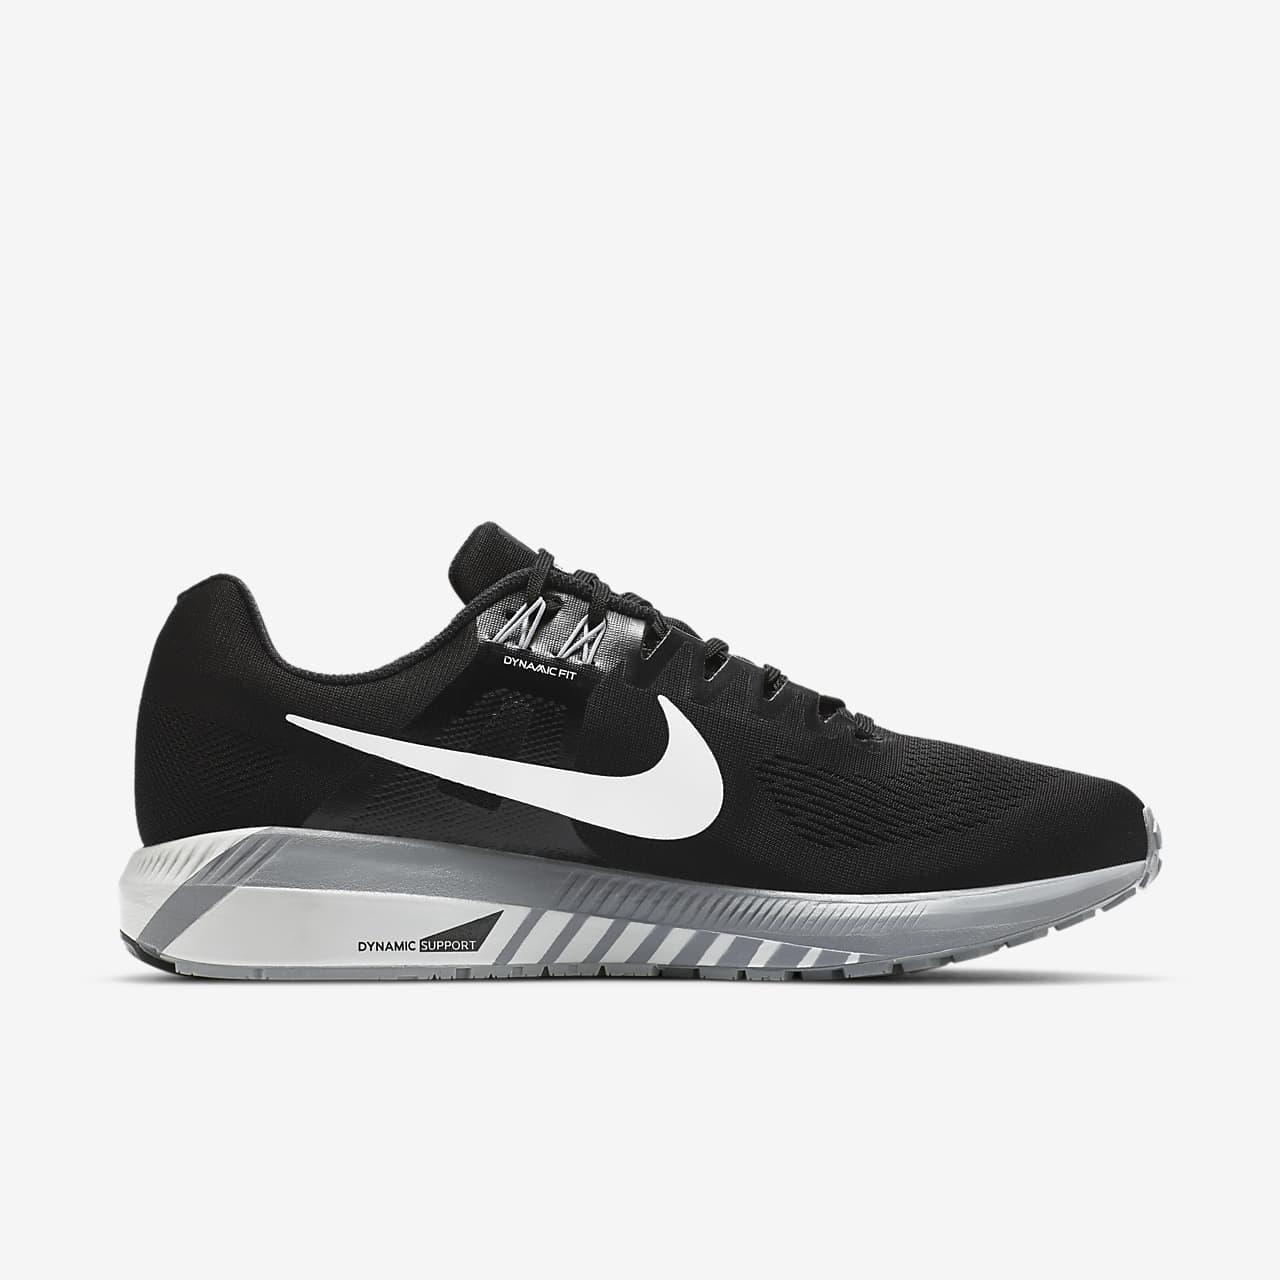 ... Scarpa da running Nike Air Zoom Structure 21 - Uomo